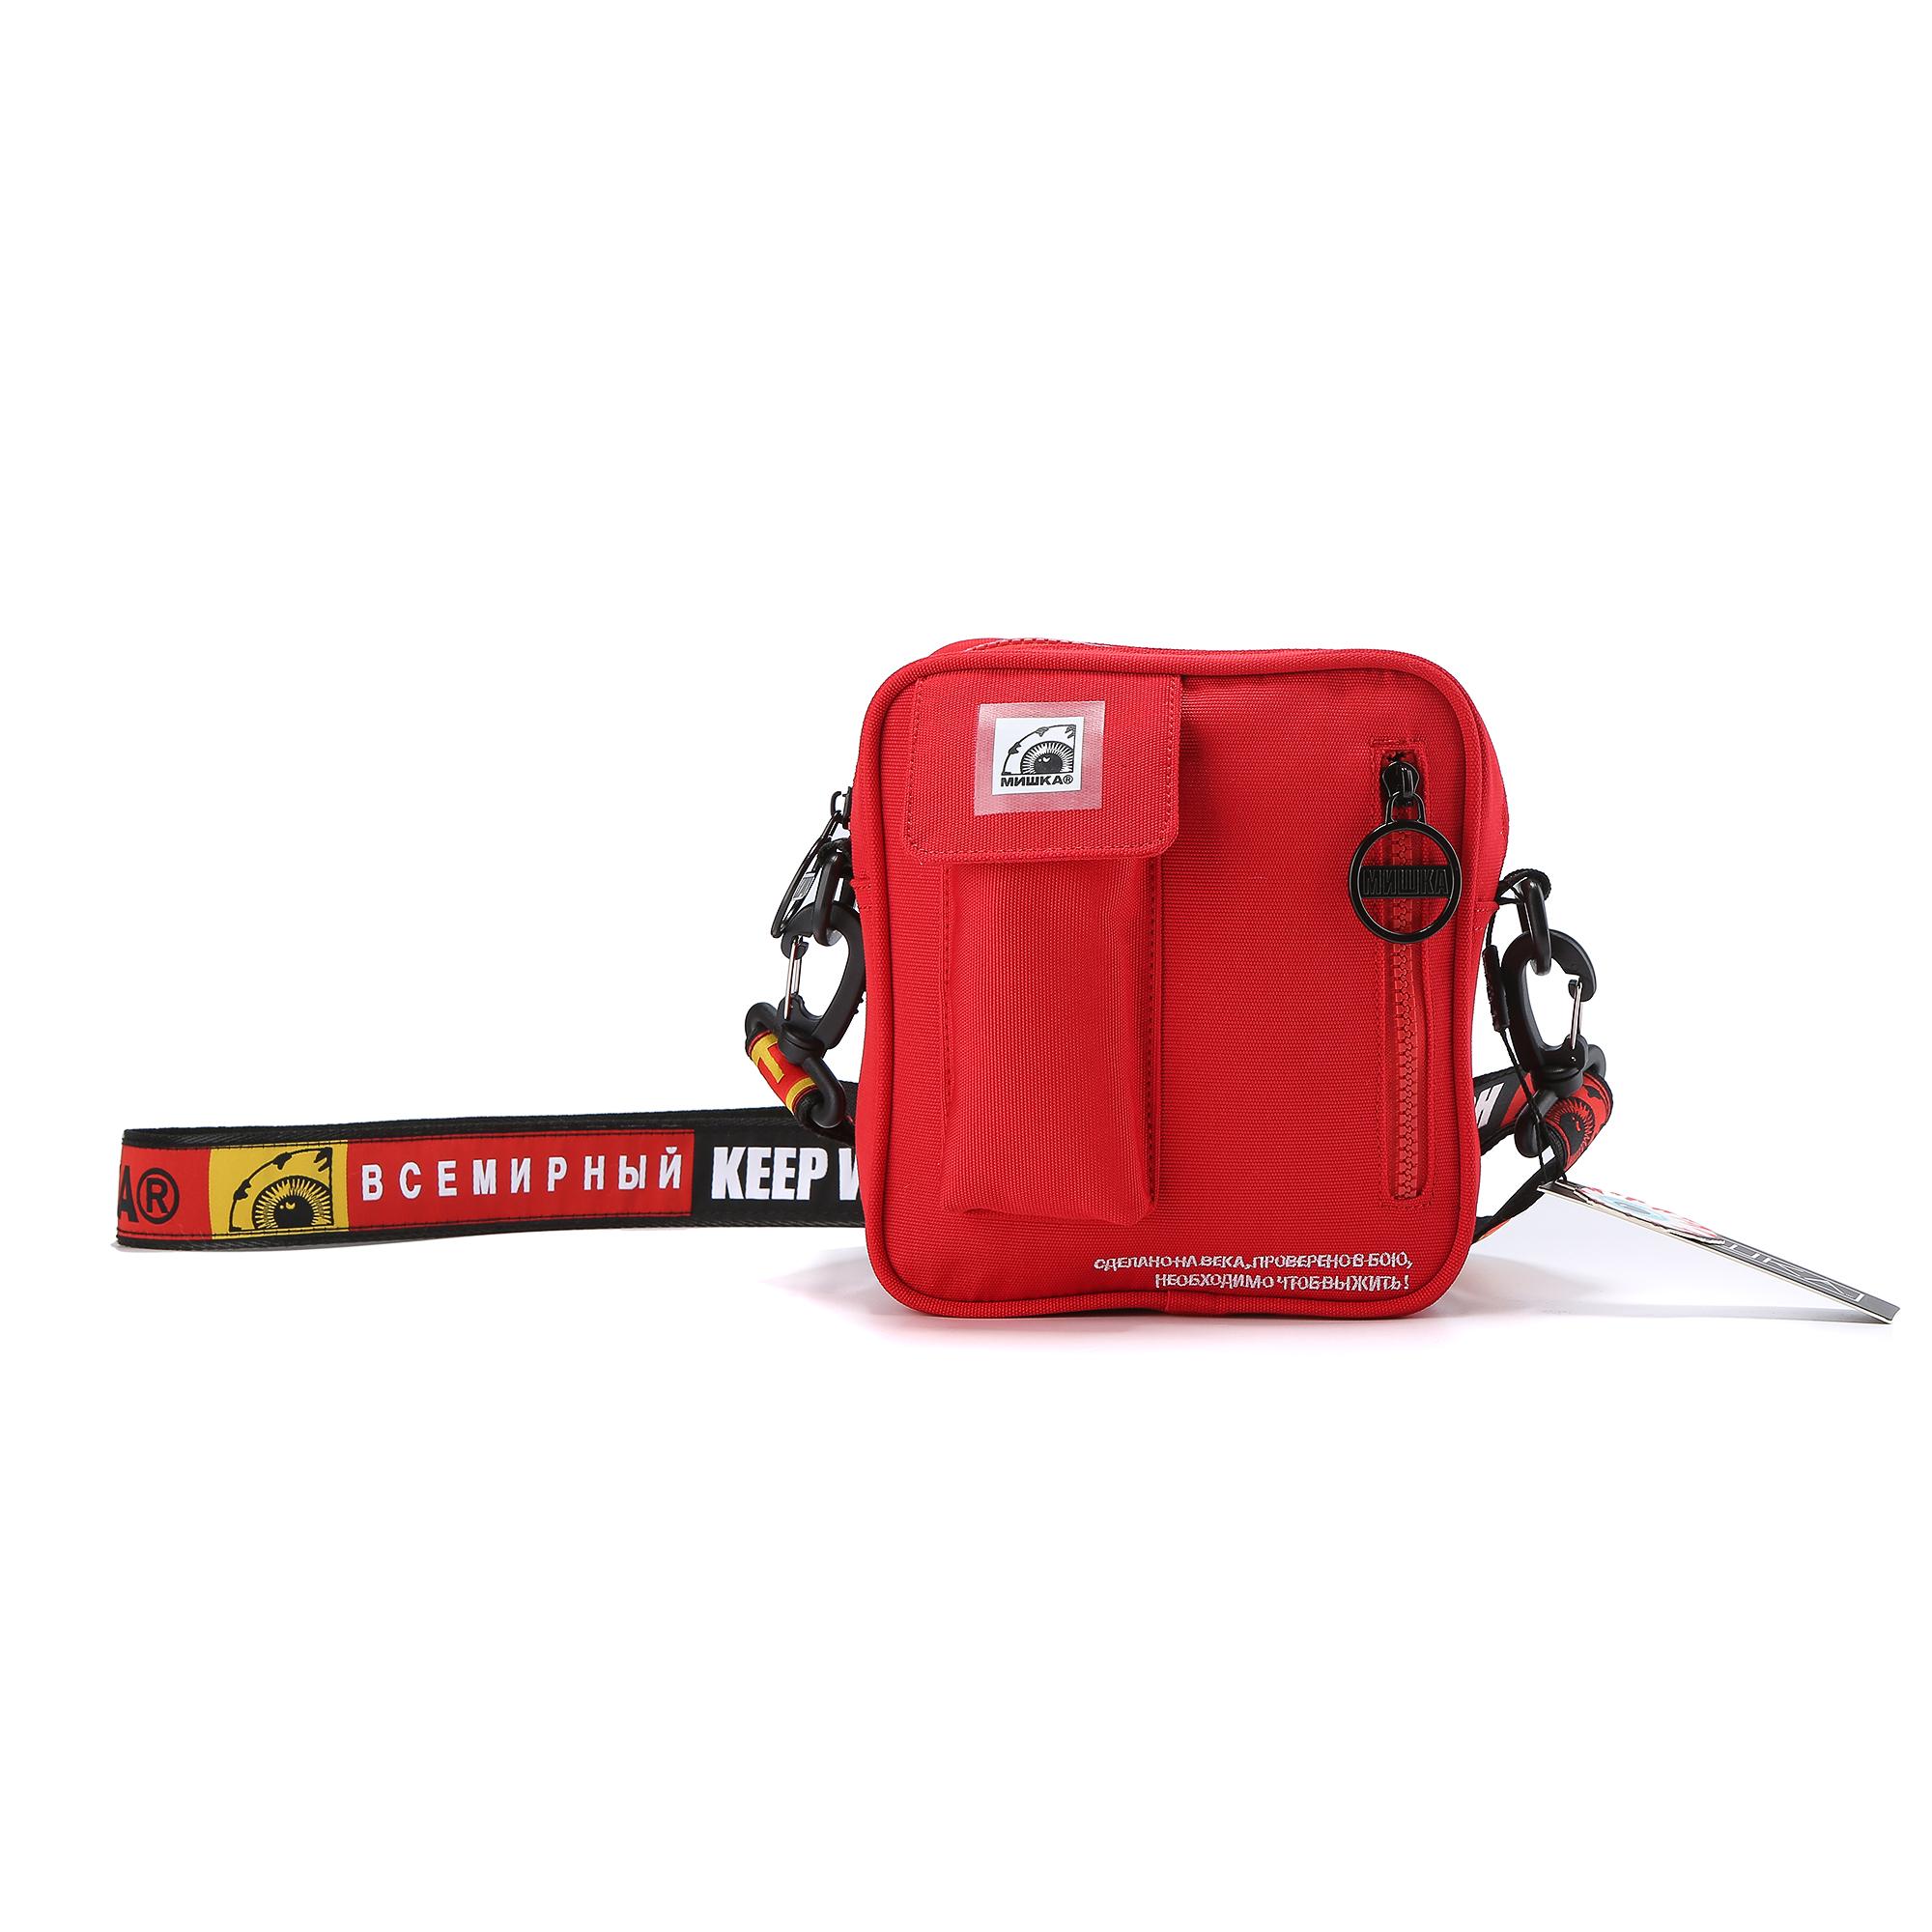 Keep Watch Essentials Shoulder Bag